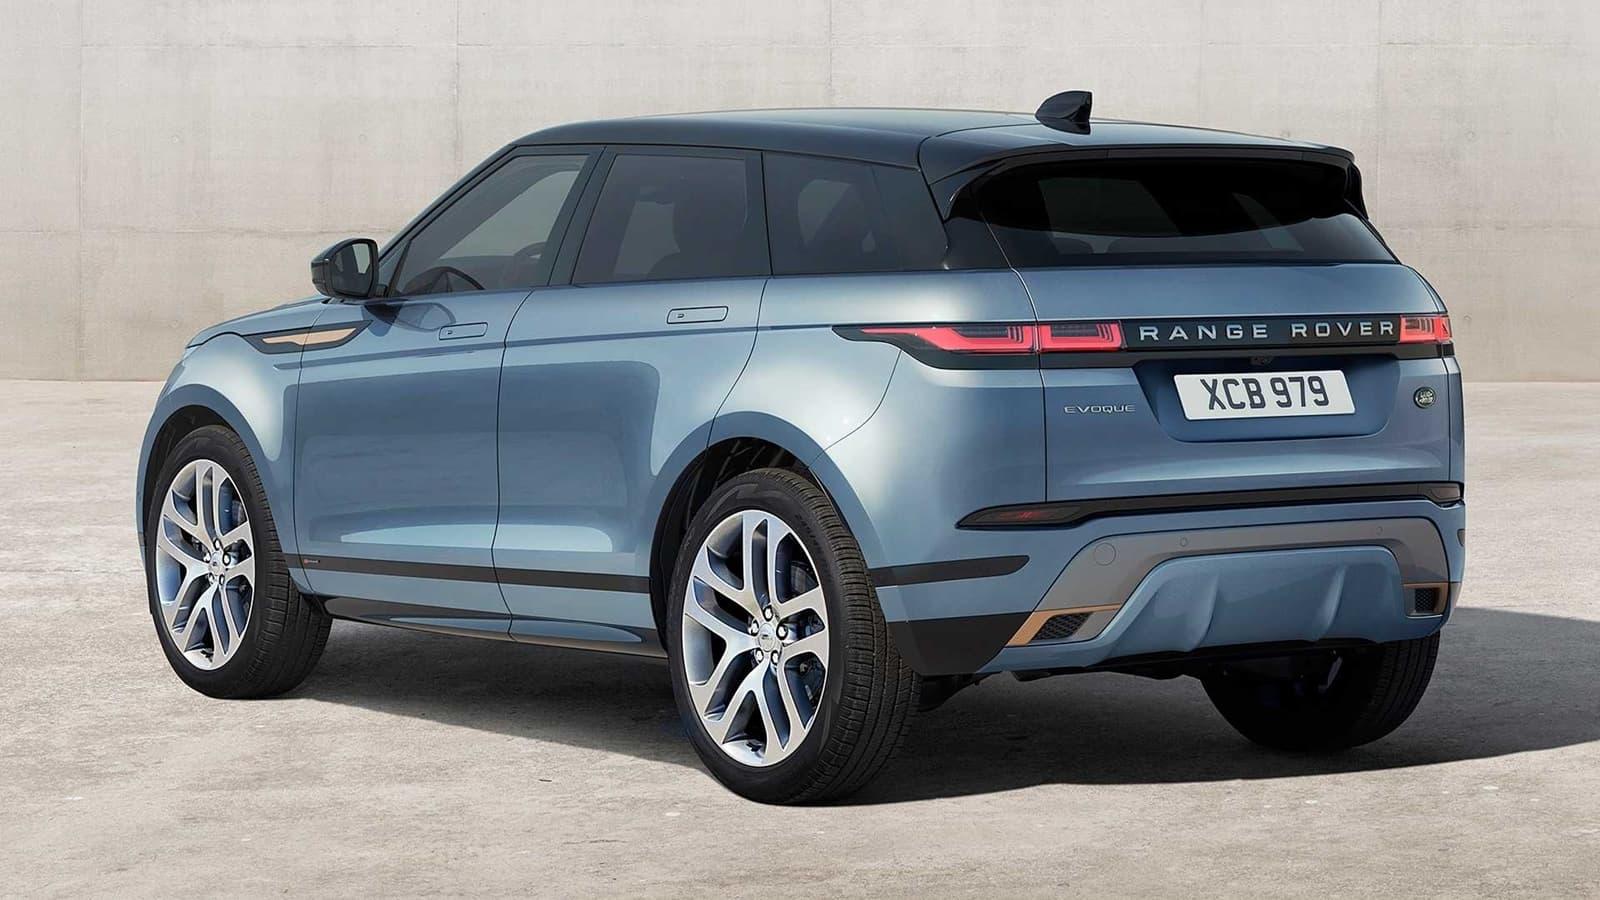 Range Rover Evoque 2019 1118 058